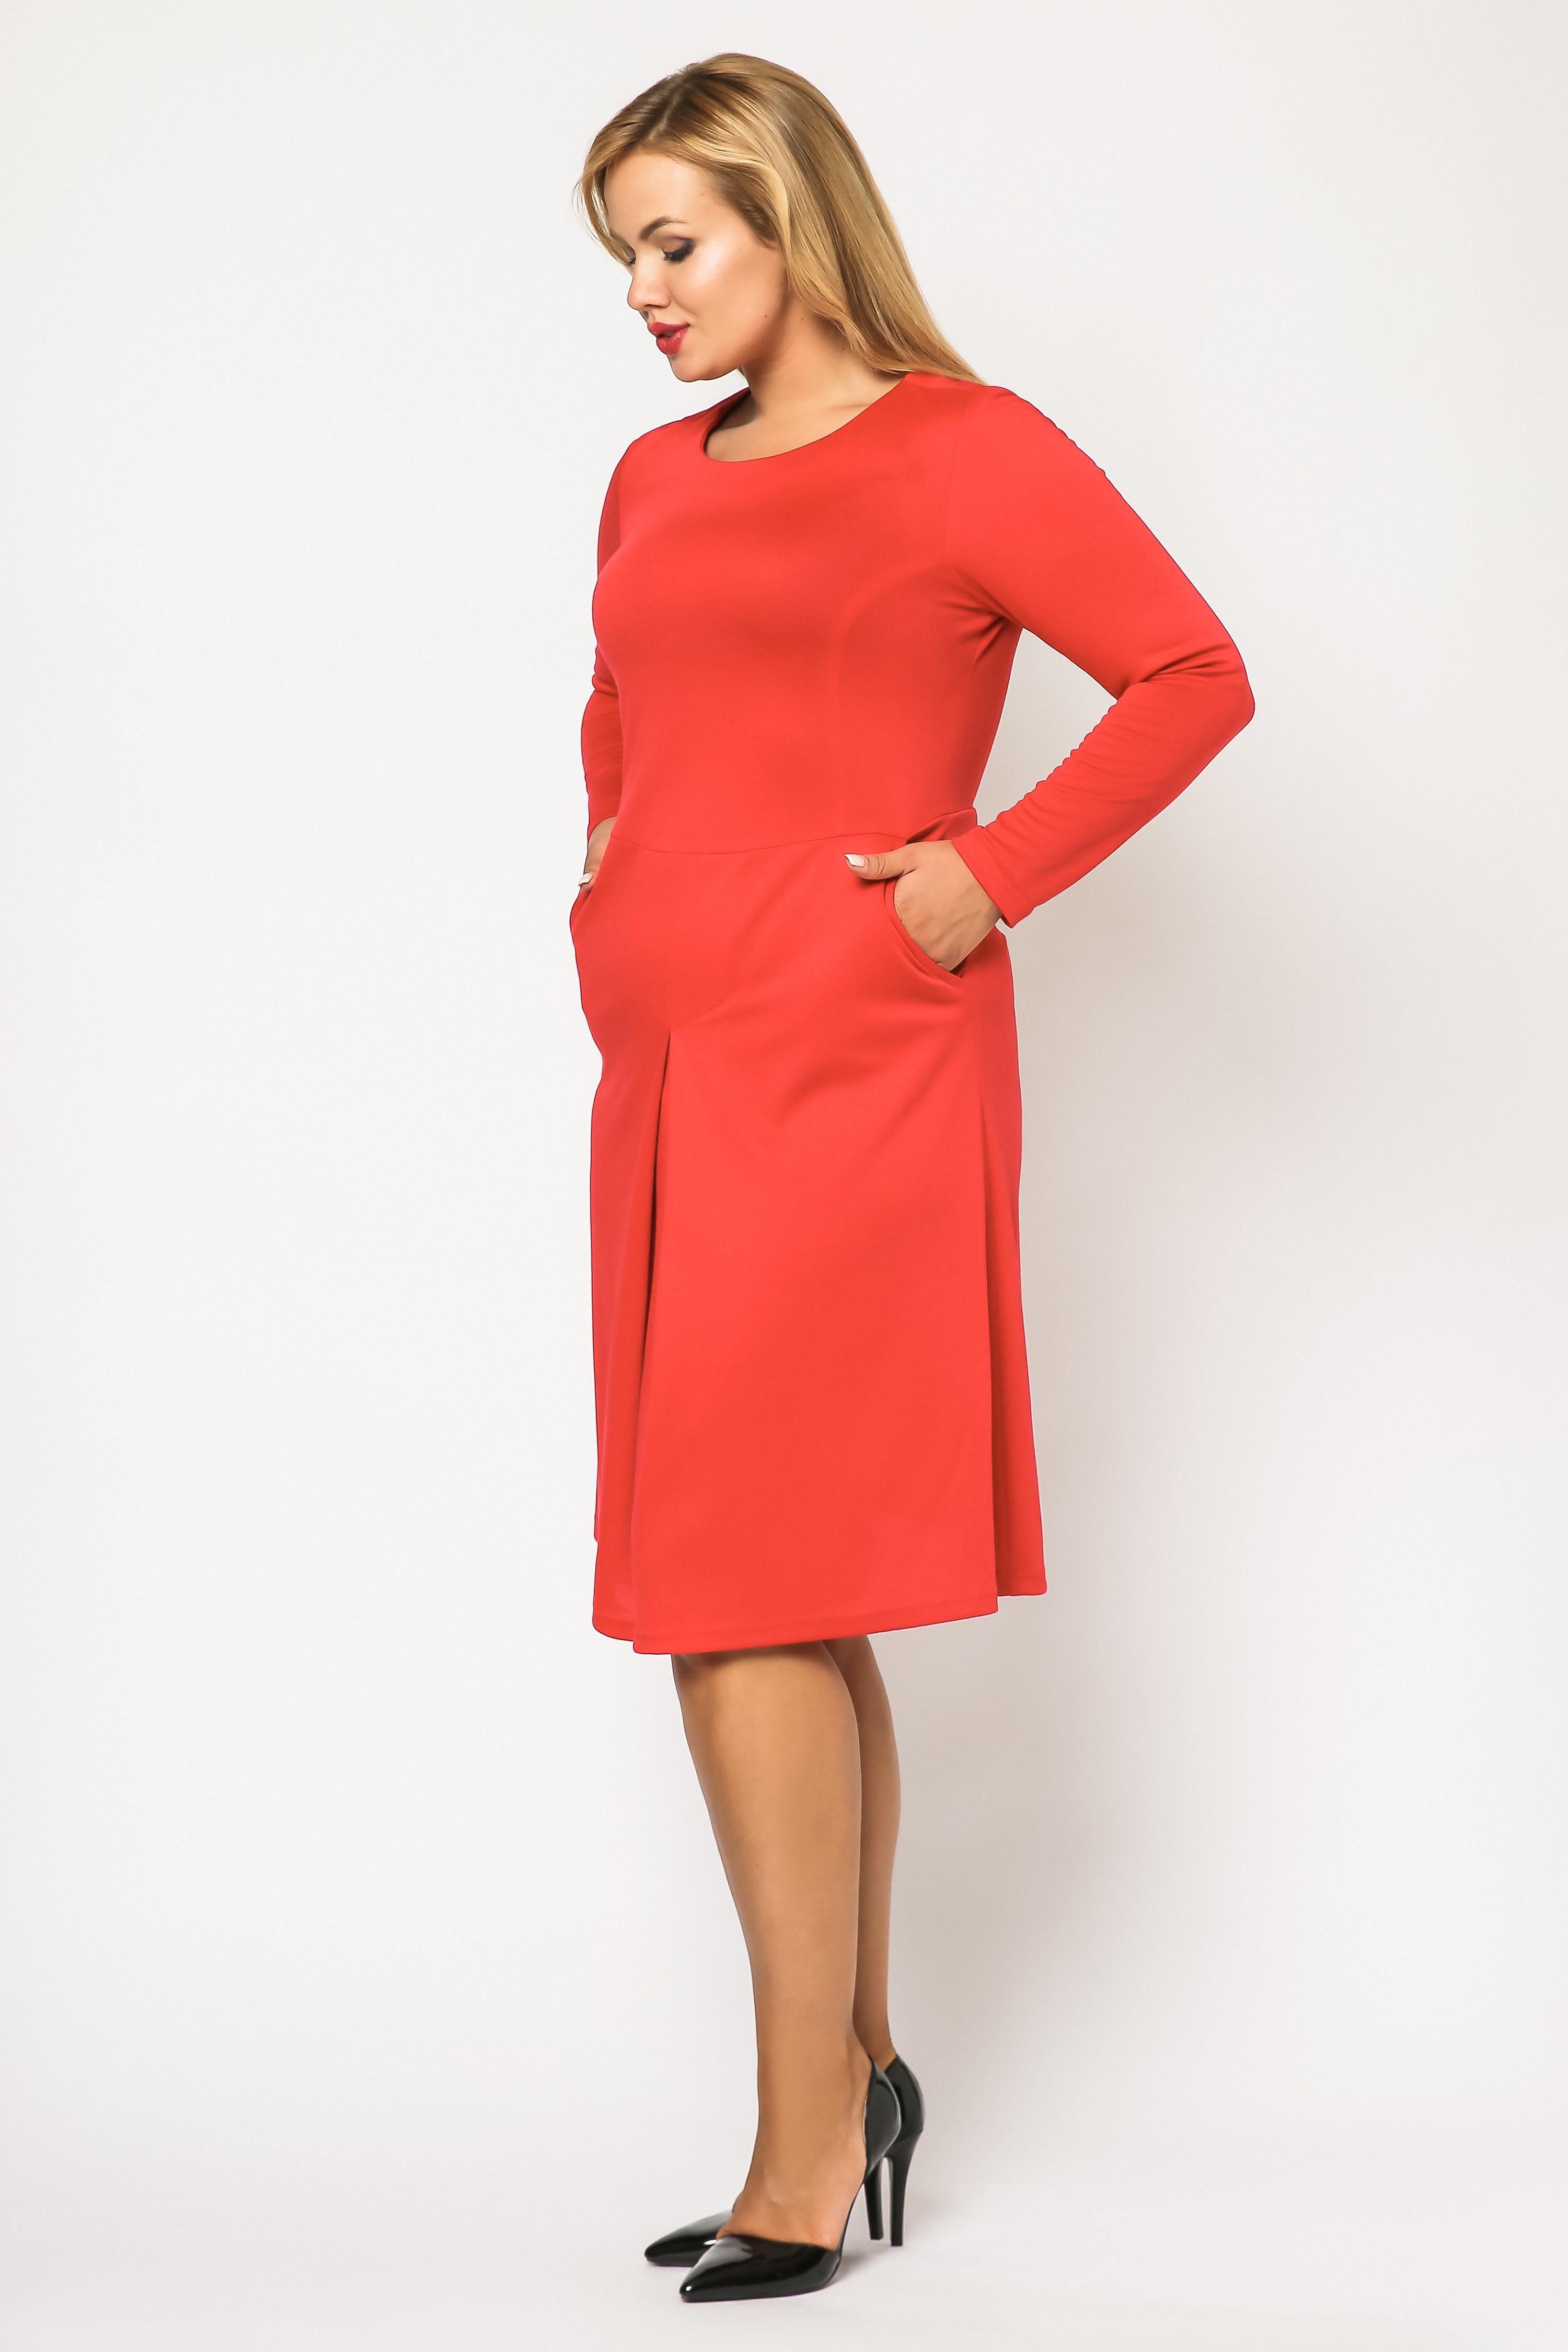 Alice dress red